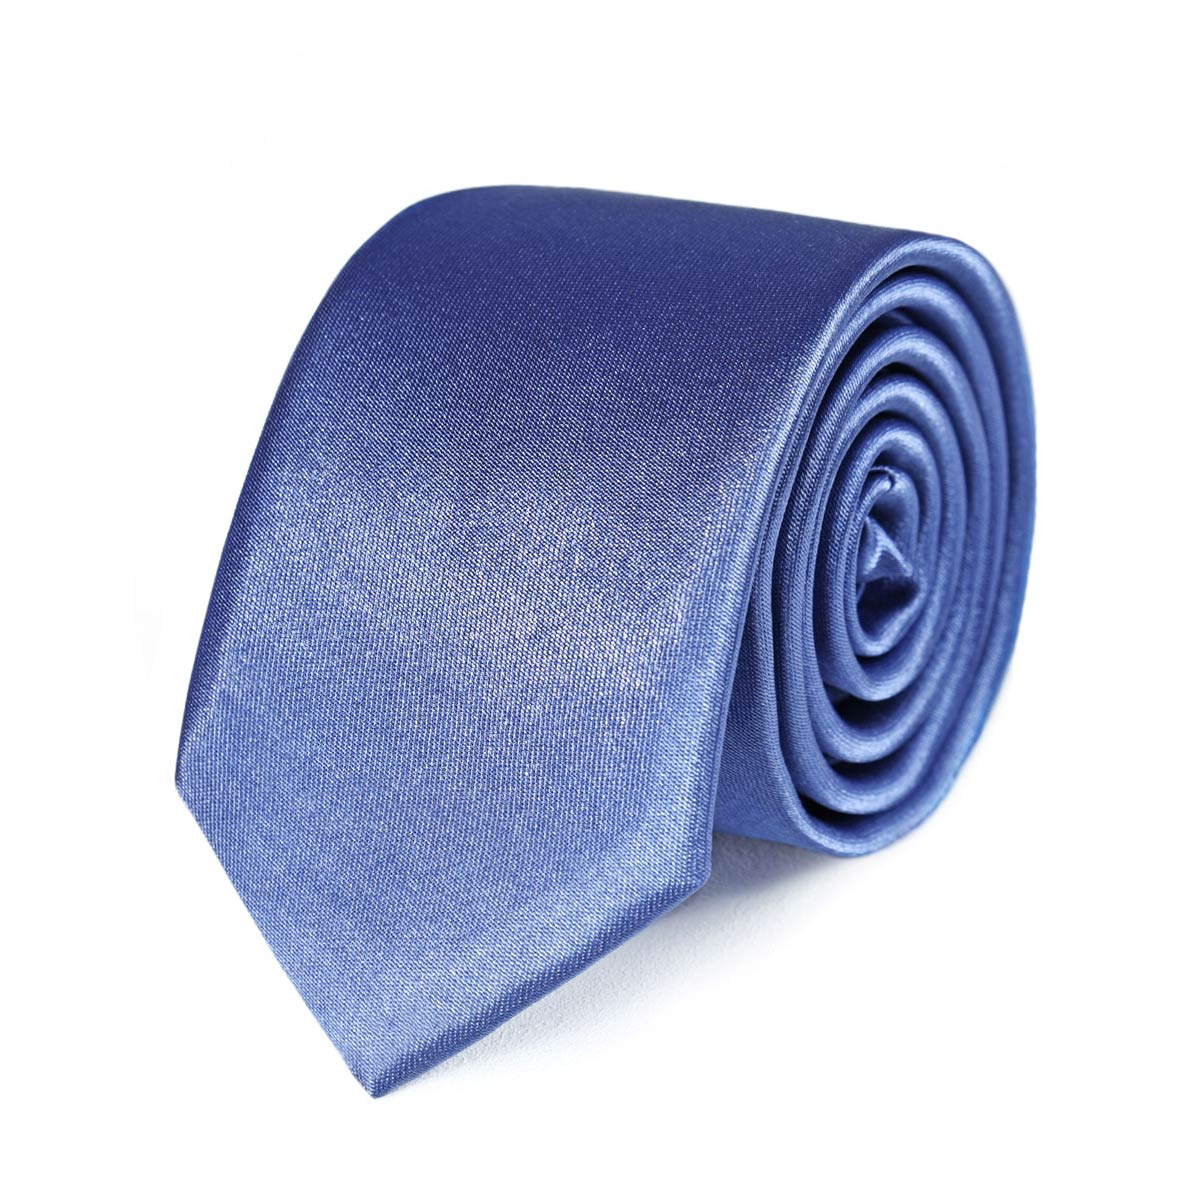 _Cravate-slim-bleu-jean-homme